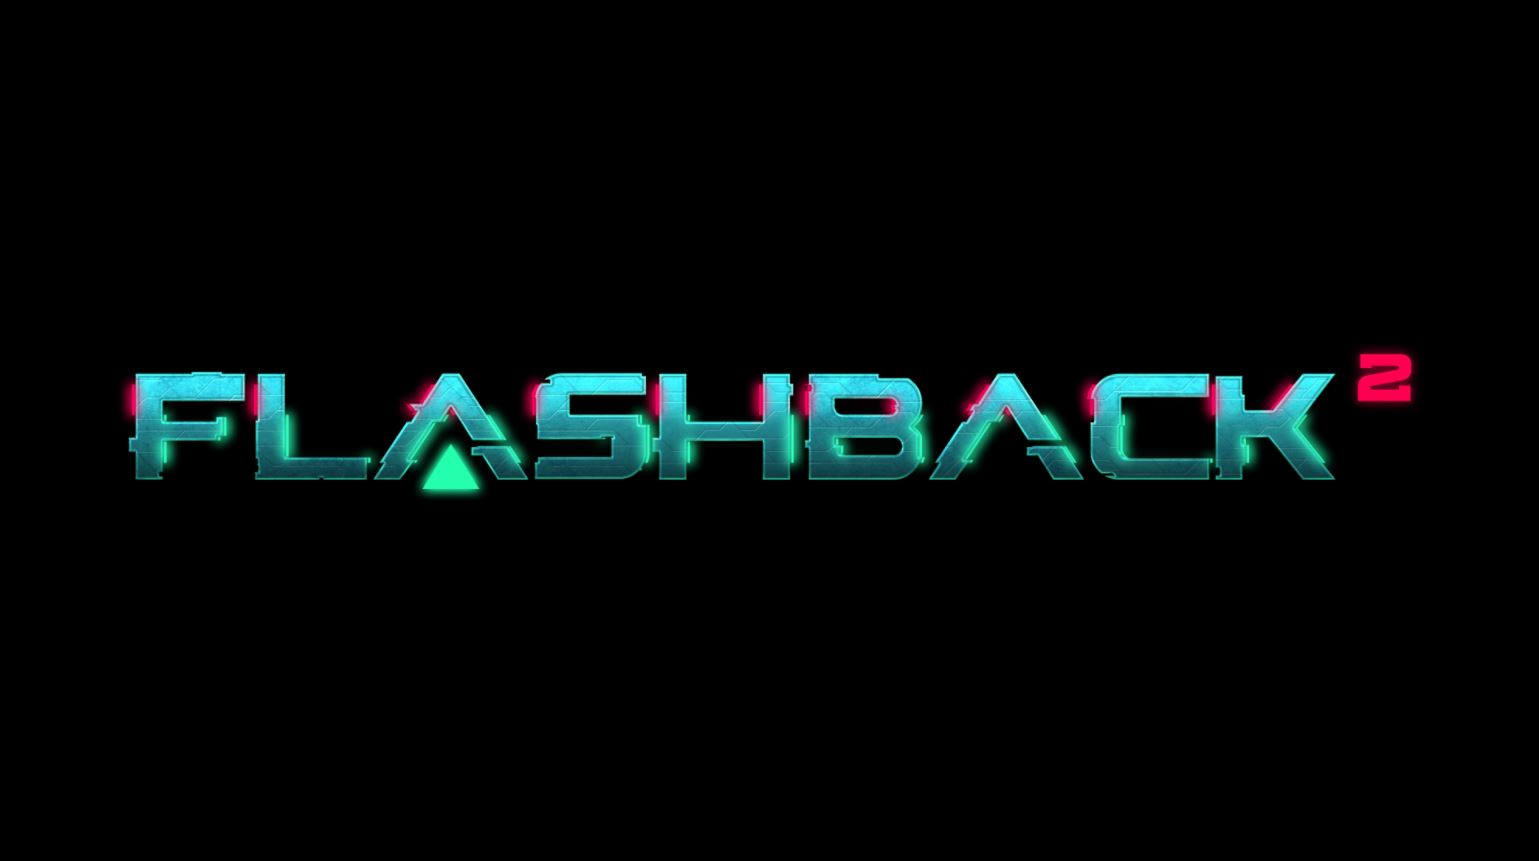 flashback-2-ps5-ps4-news-reviews-videos